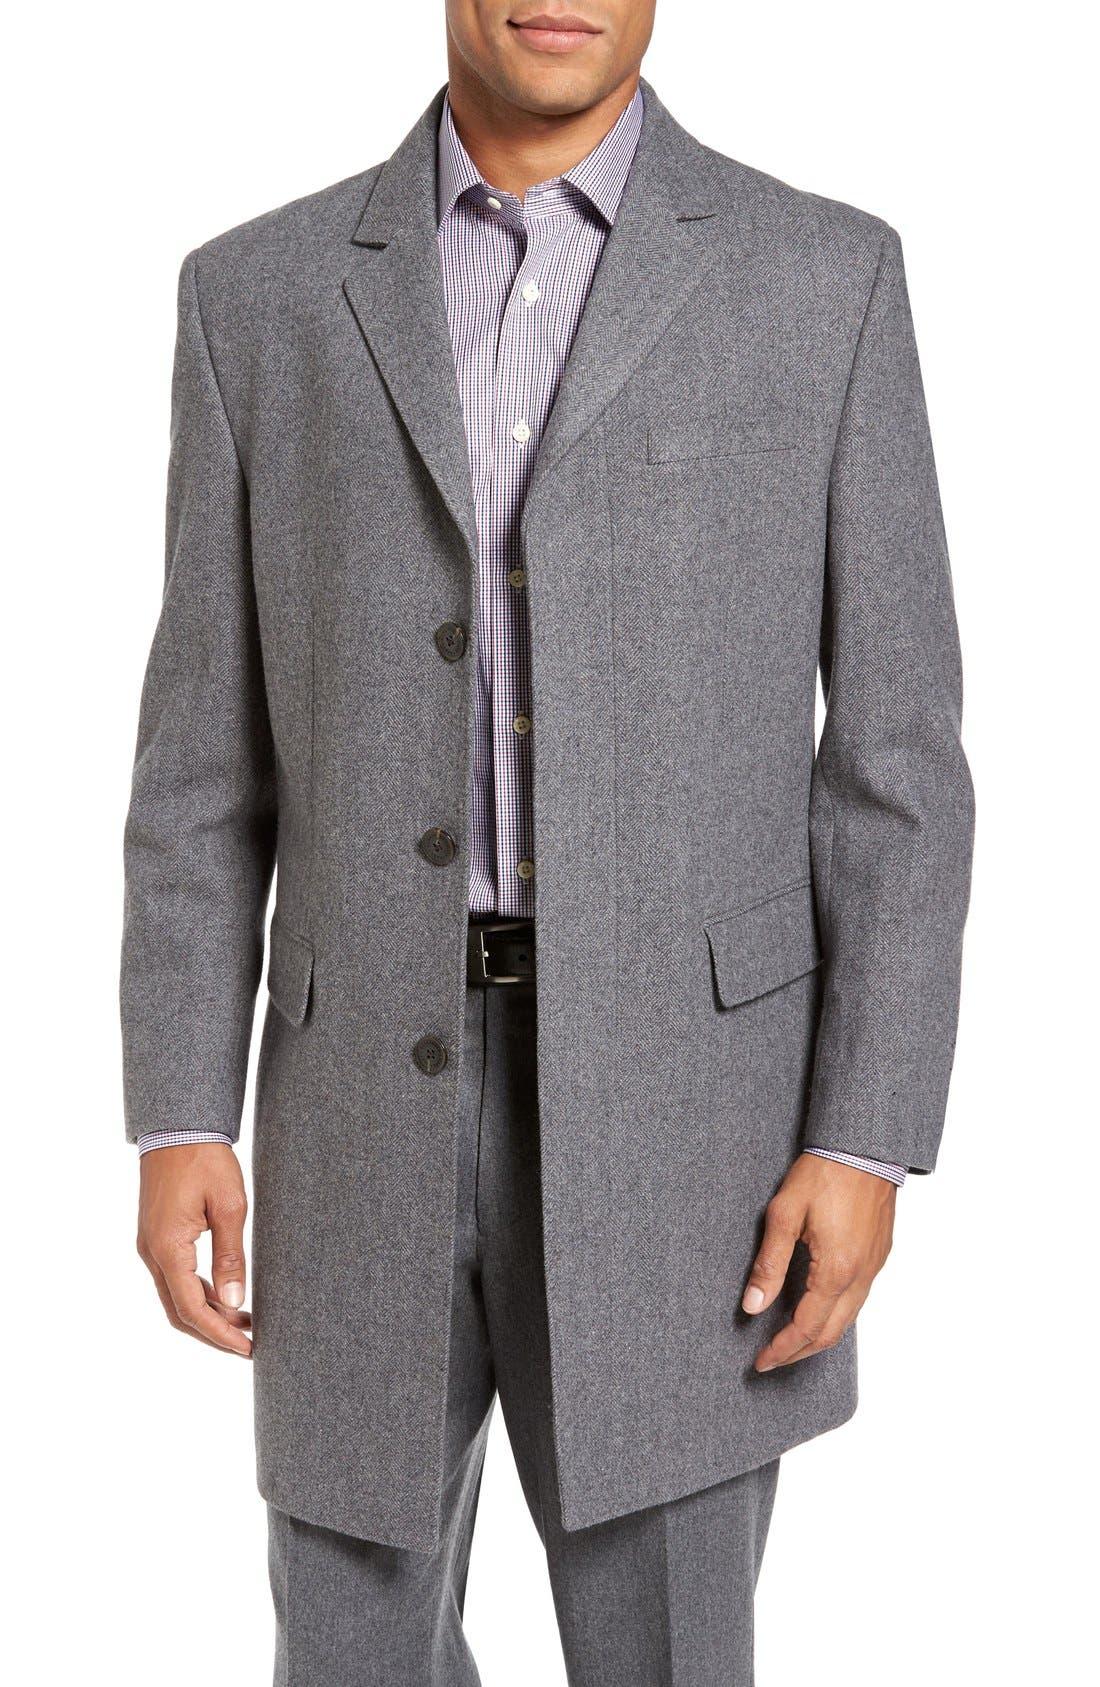 Maitland Modern Fit Wool Blend Overcoat,                         Main,                         color, Light Grey